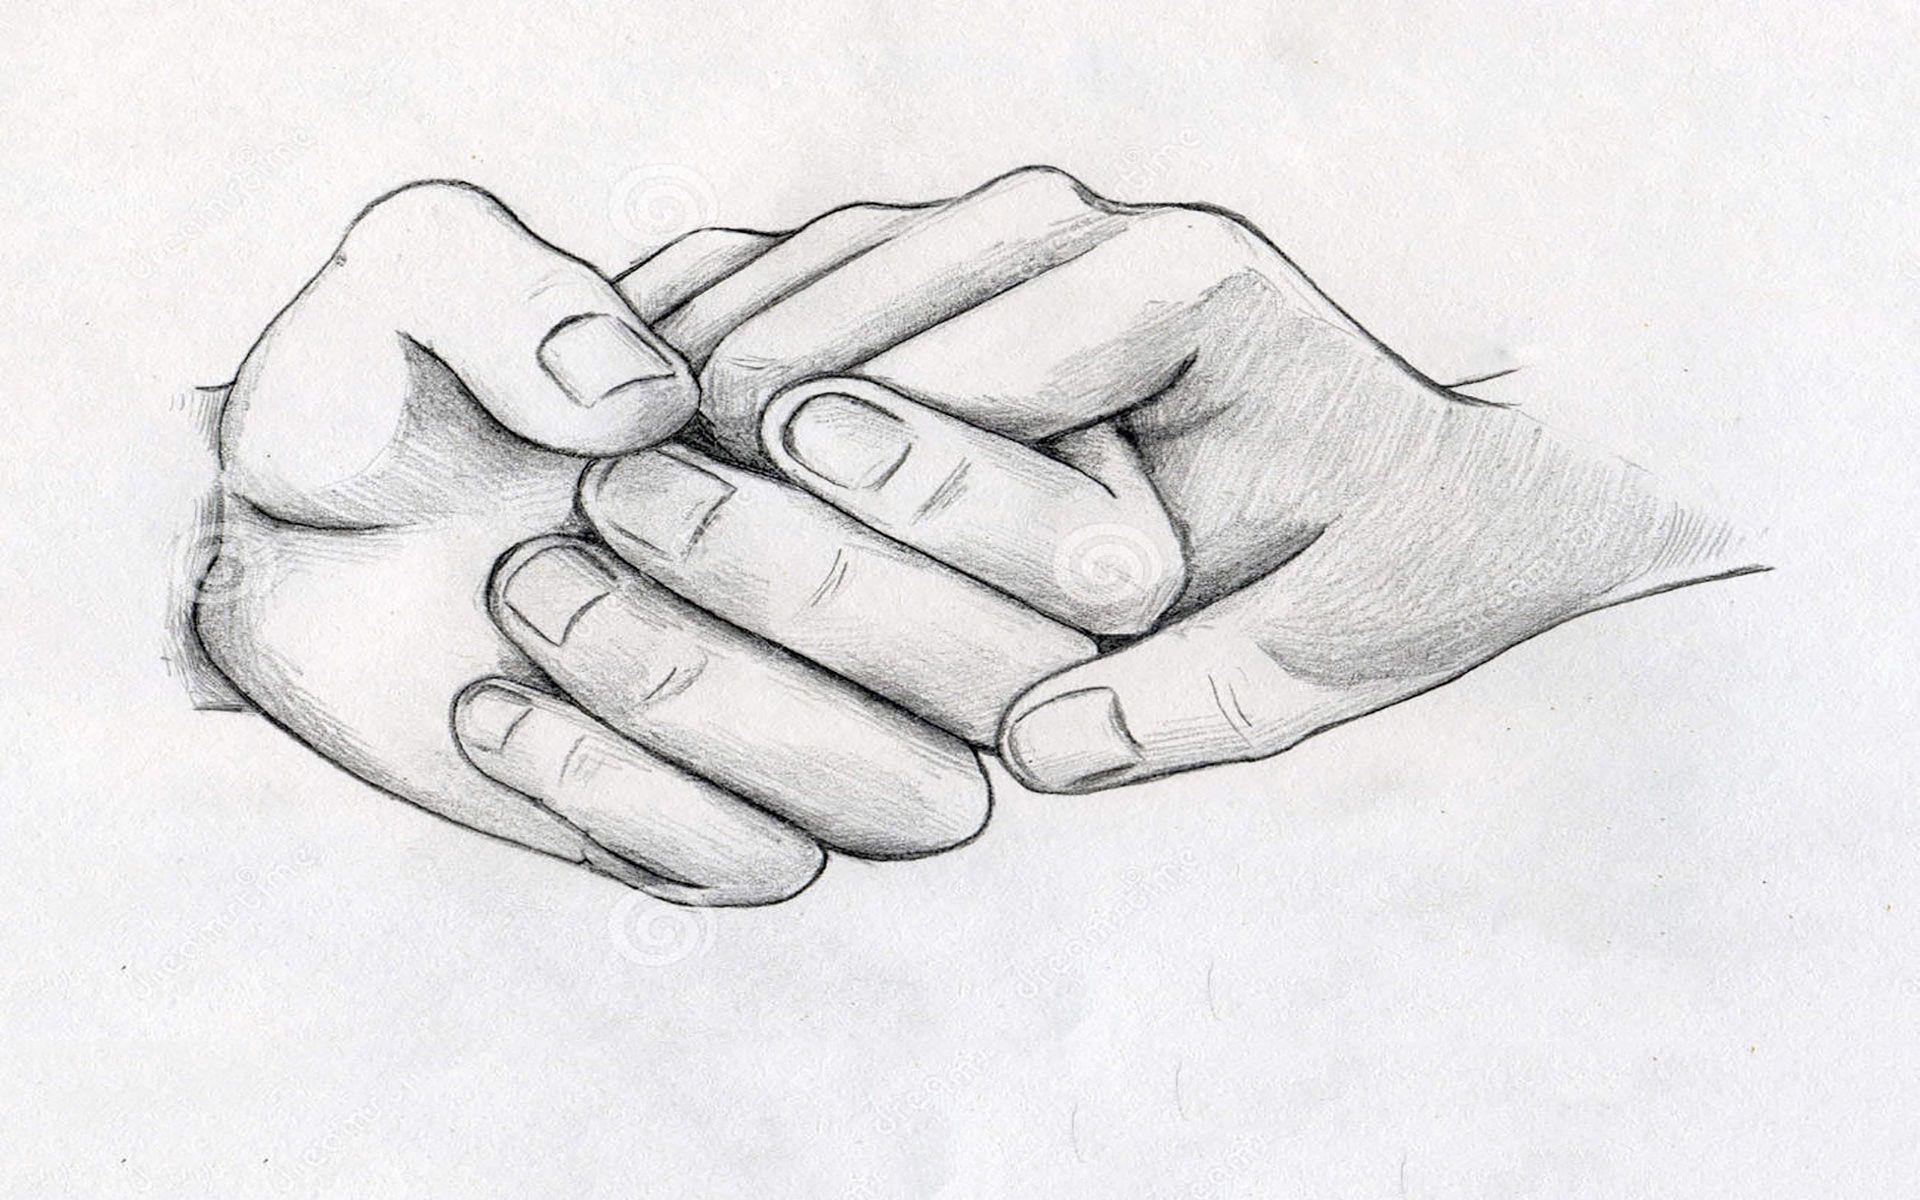 Love Romantic Simple Pencil Drawing - HD Wallpaper